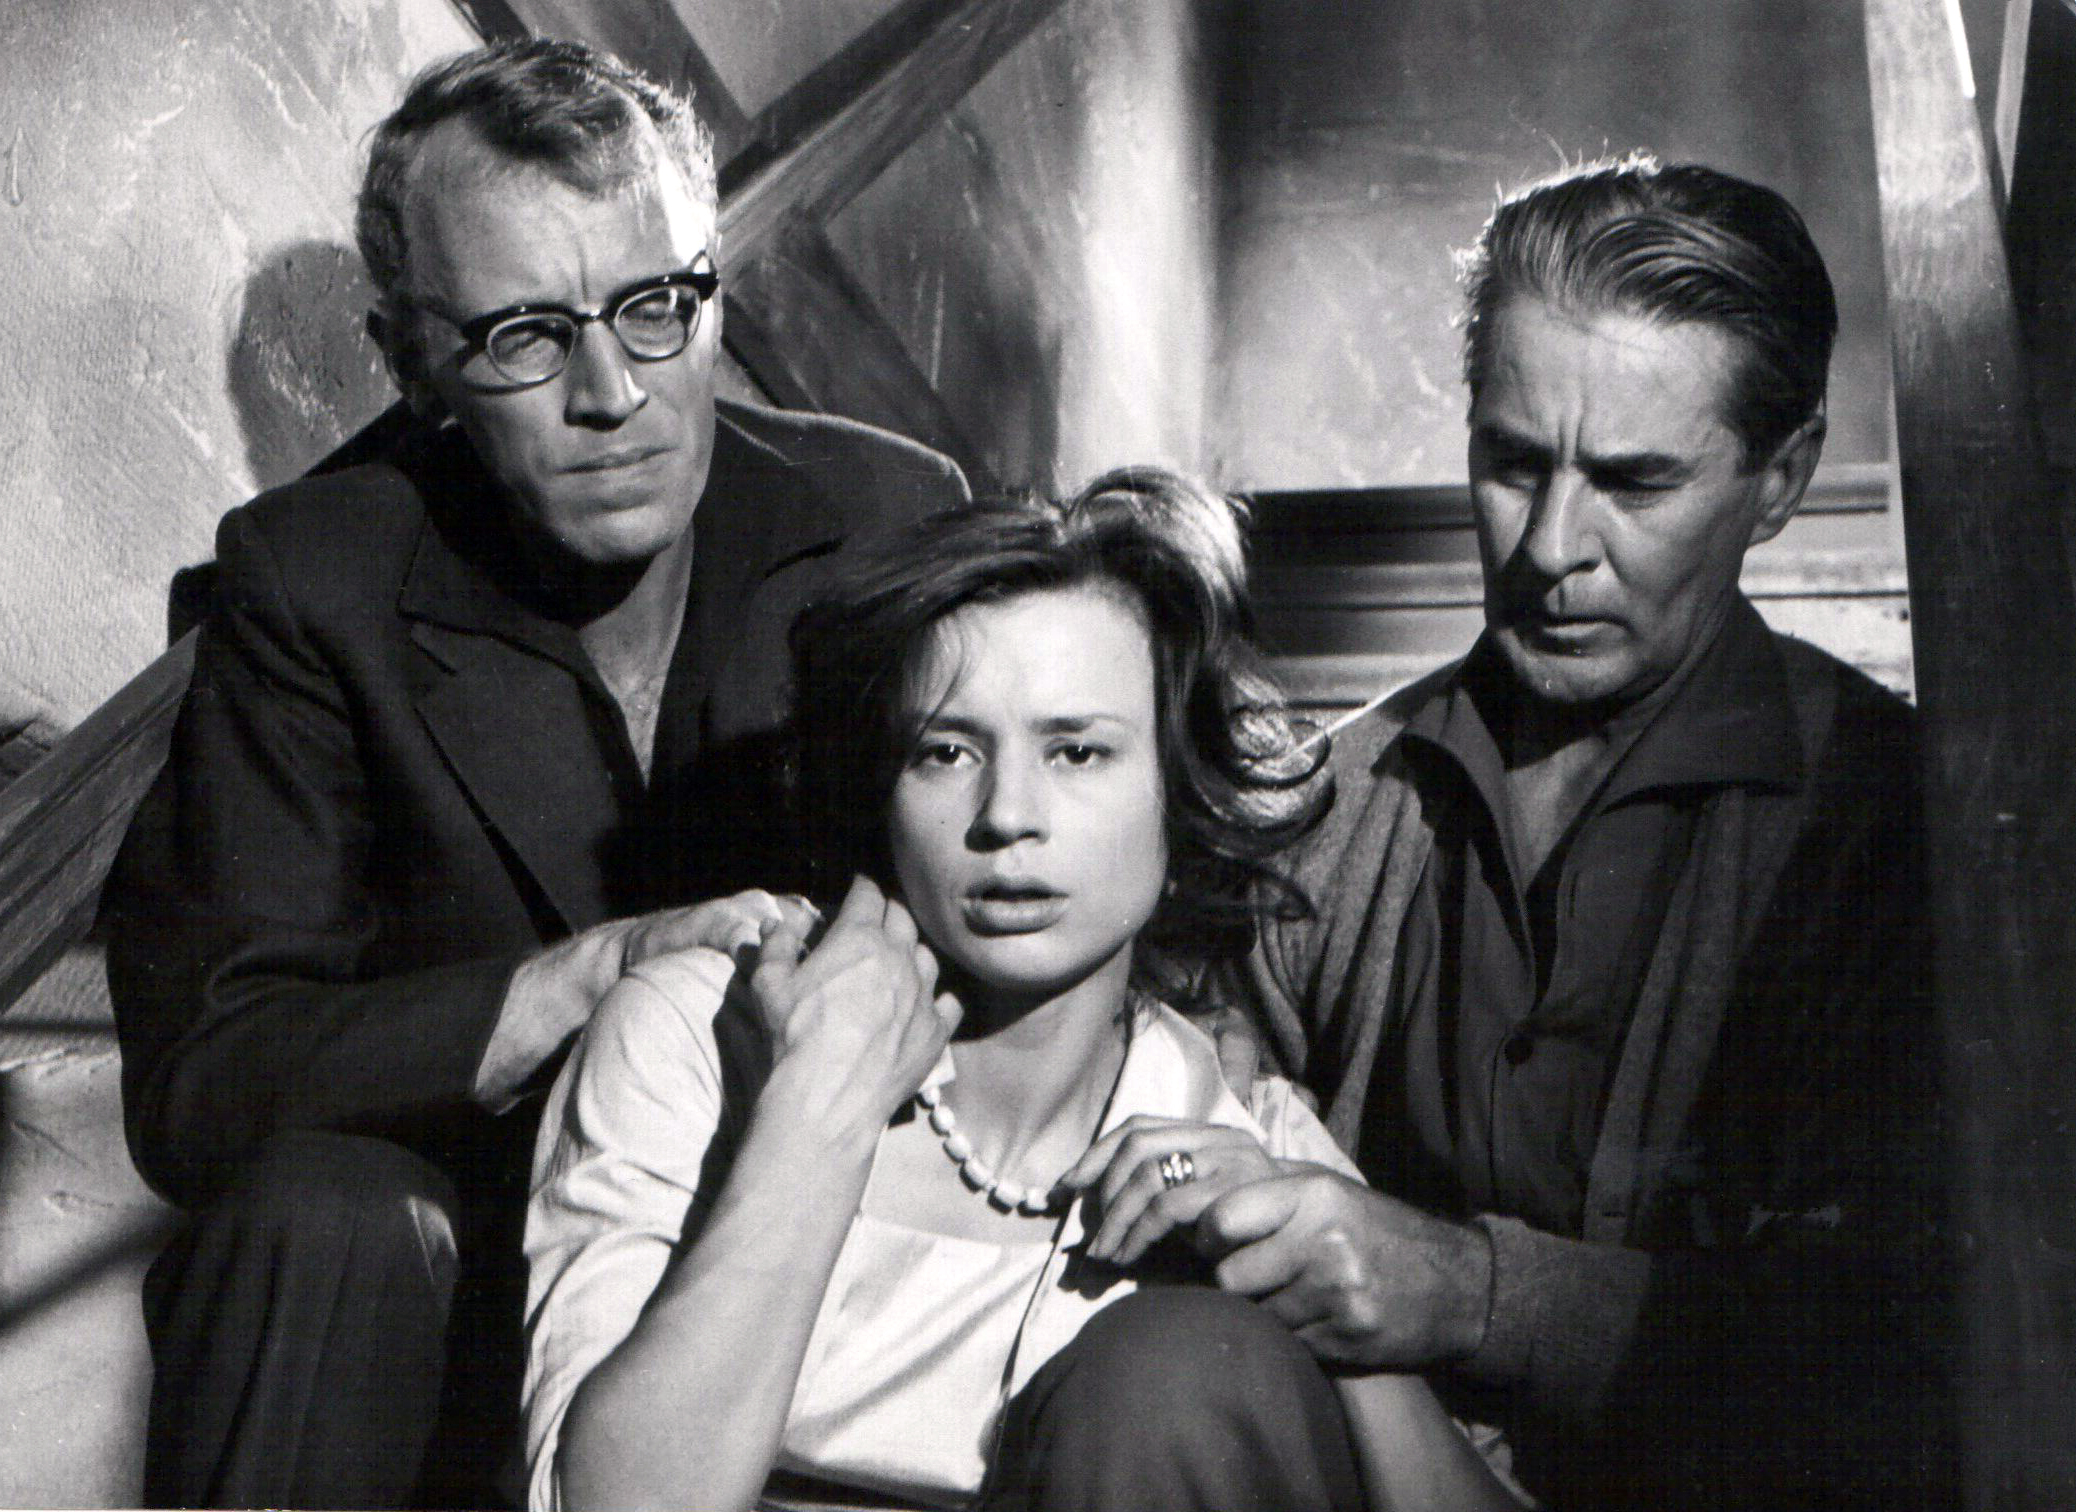 Ingmar Bergman's Through A Glass Darkly (1961)